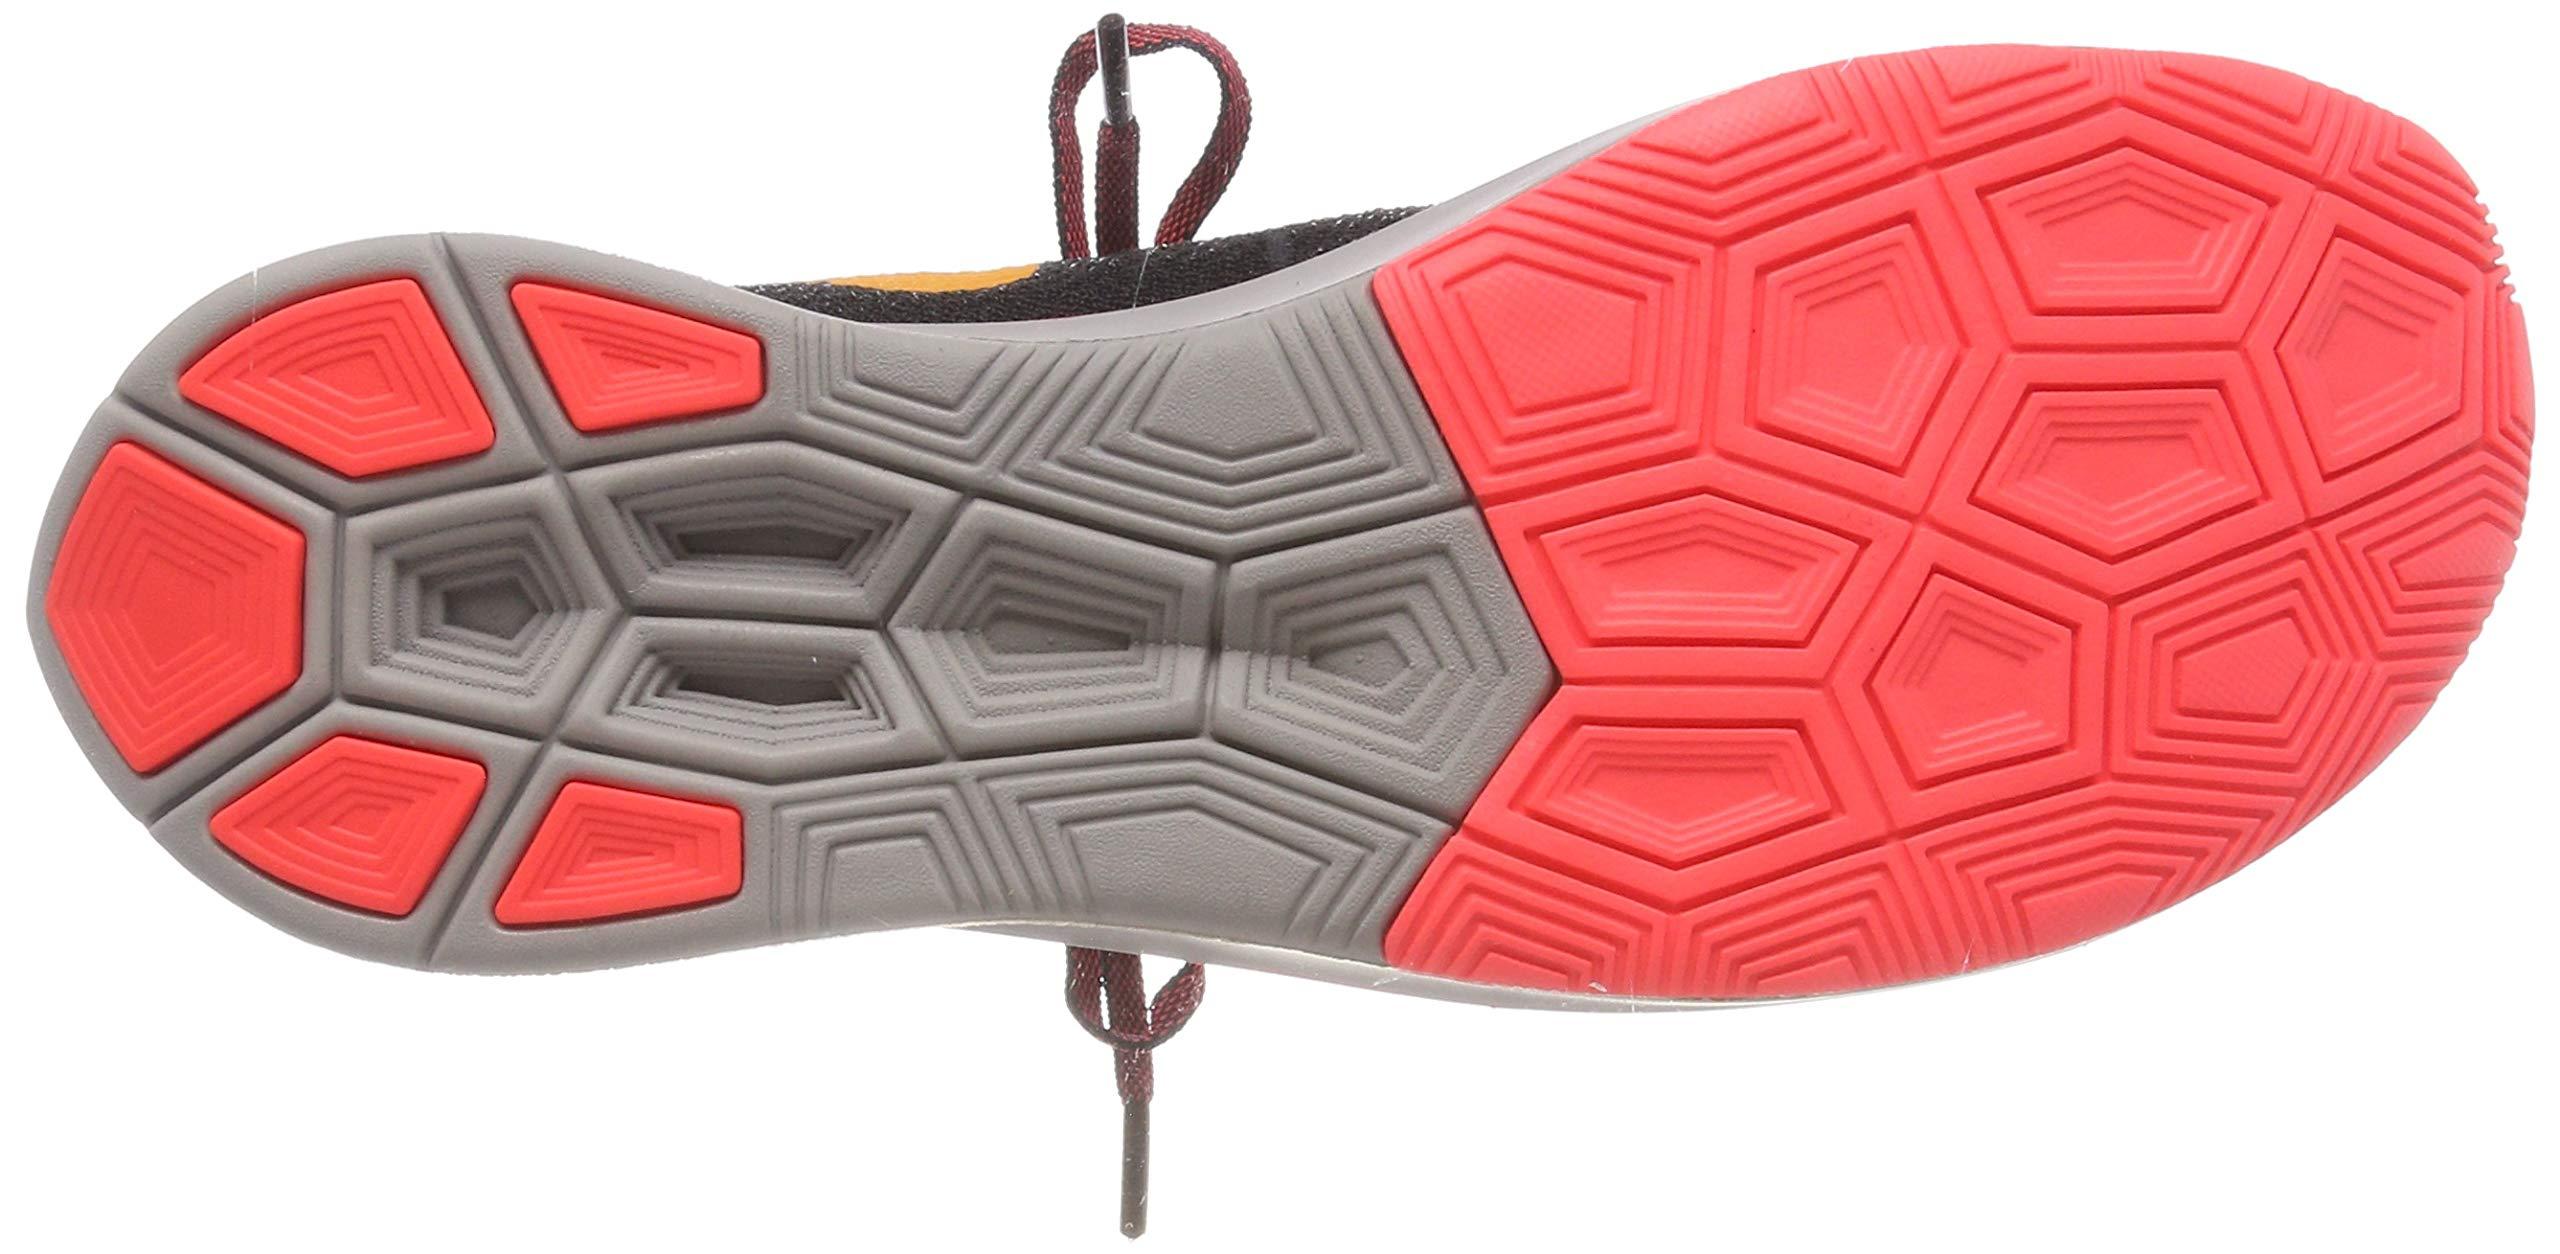 Nike Zoom Fly Flyknit Men's Running Shoe Black/Orange Peel-Flash Crimson Size 8 M US by Nike (Image #3)